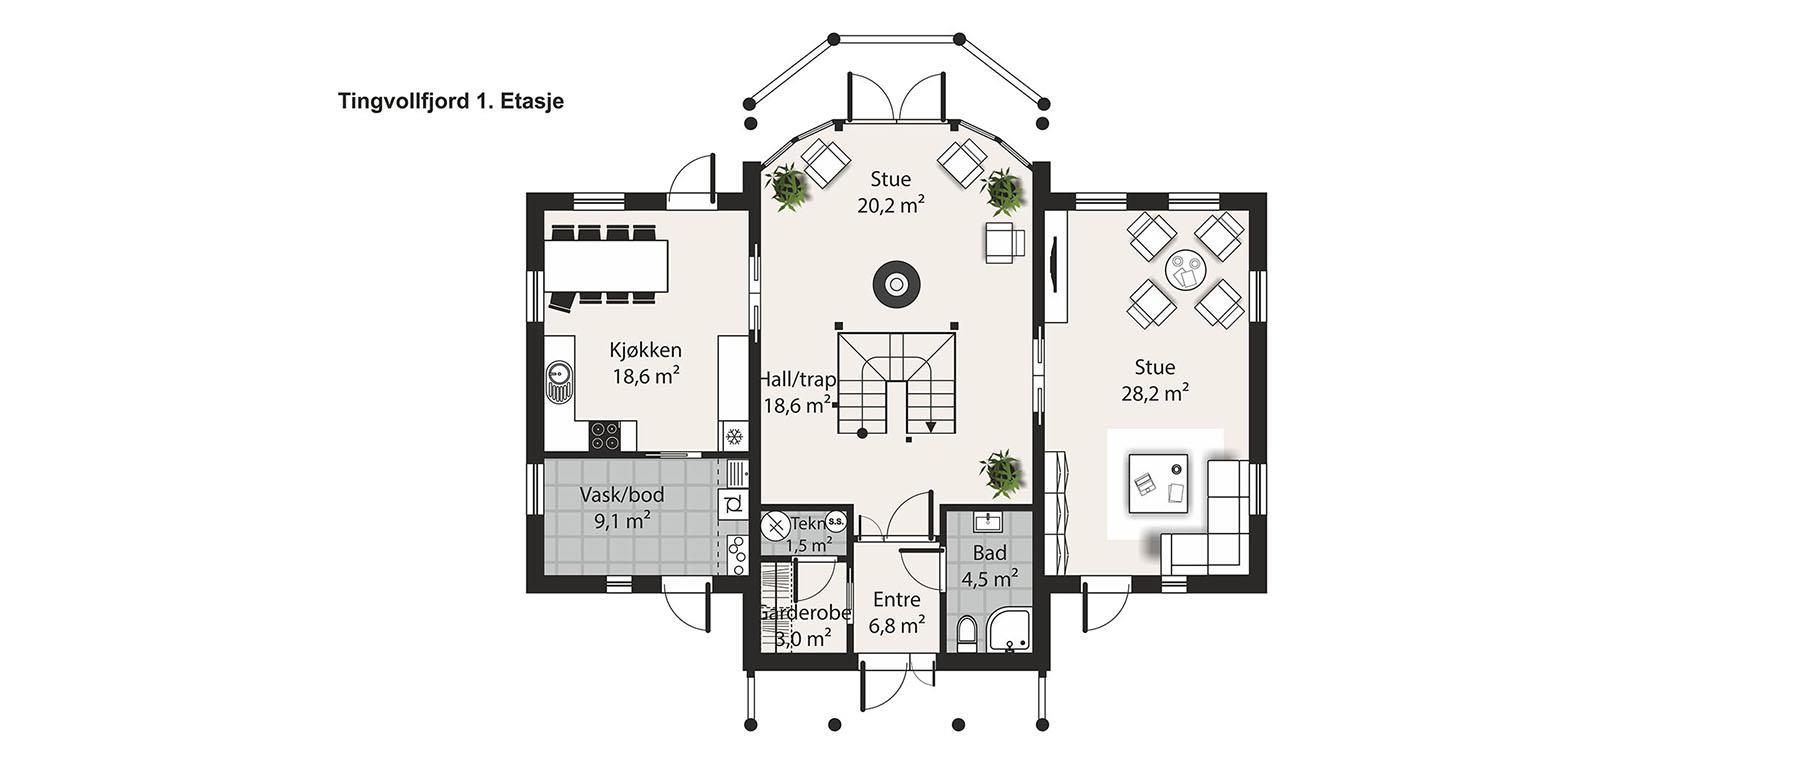 Hus 1 Norge Herregårds - serien Tingvollfjord 1. etasje